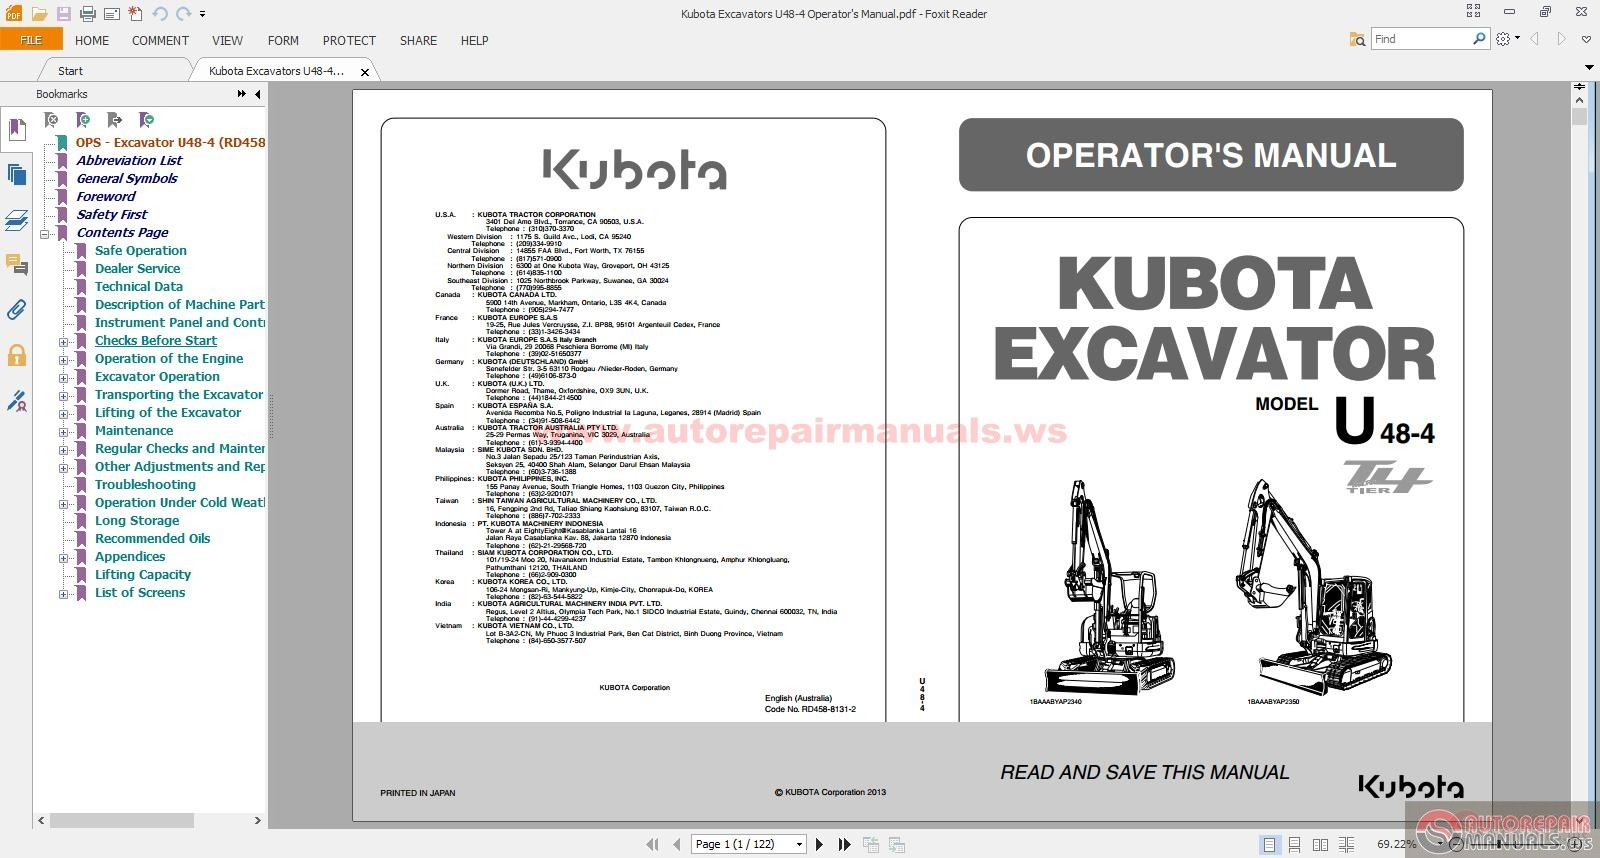 kubota excavators u48 4 operator 39 s manual auto repair. Black Bedroom Furniture Sets. Home Design Ideas